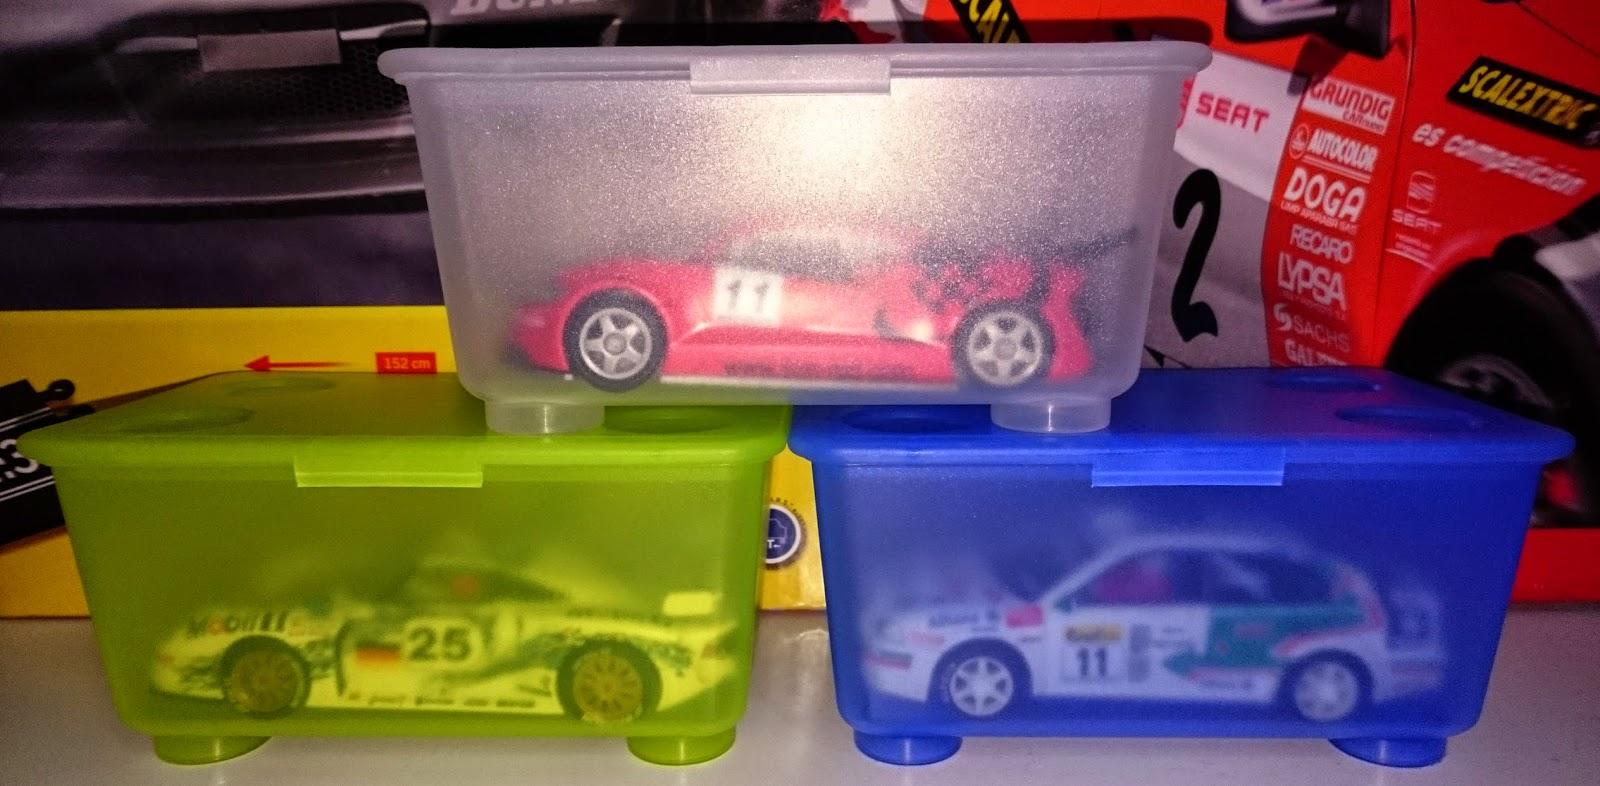 Consejos para almacenaje cajas glis de ikea mi taller - Cajas de almacenaje ikea ...